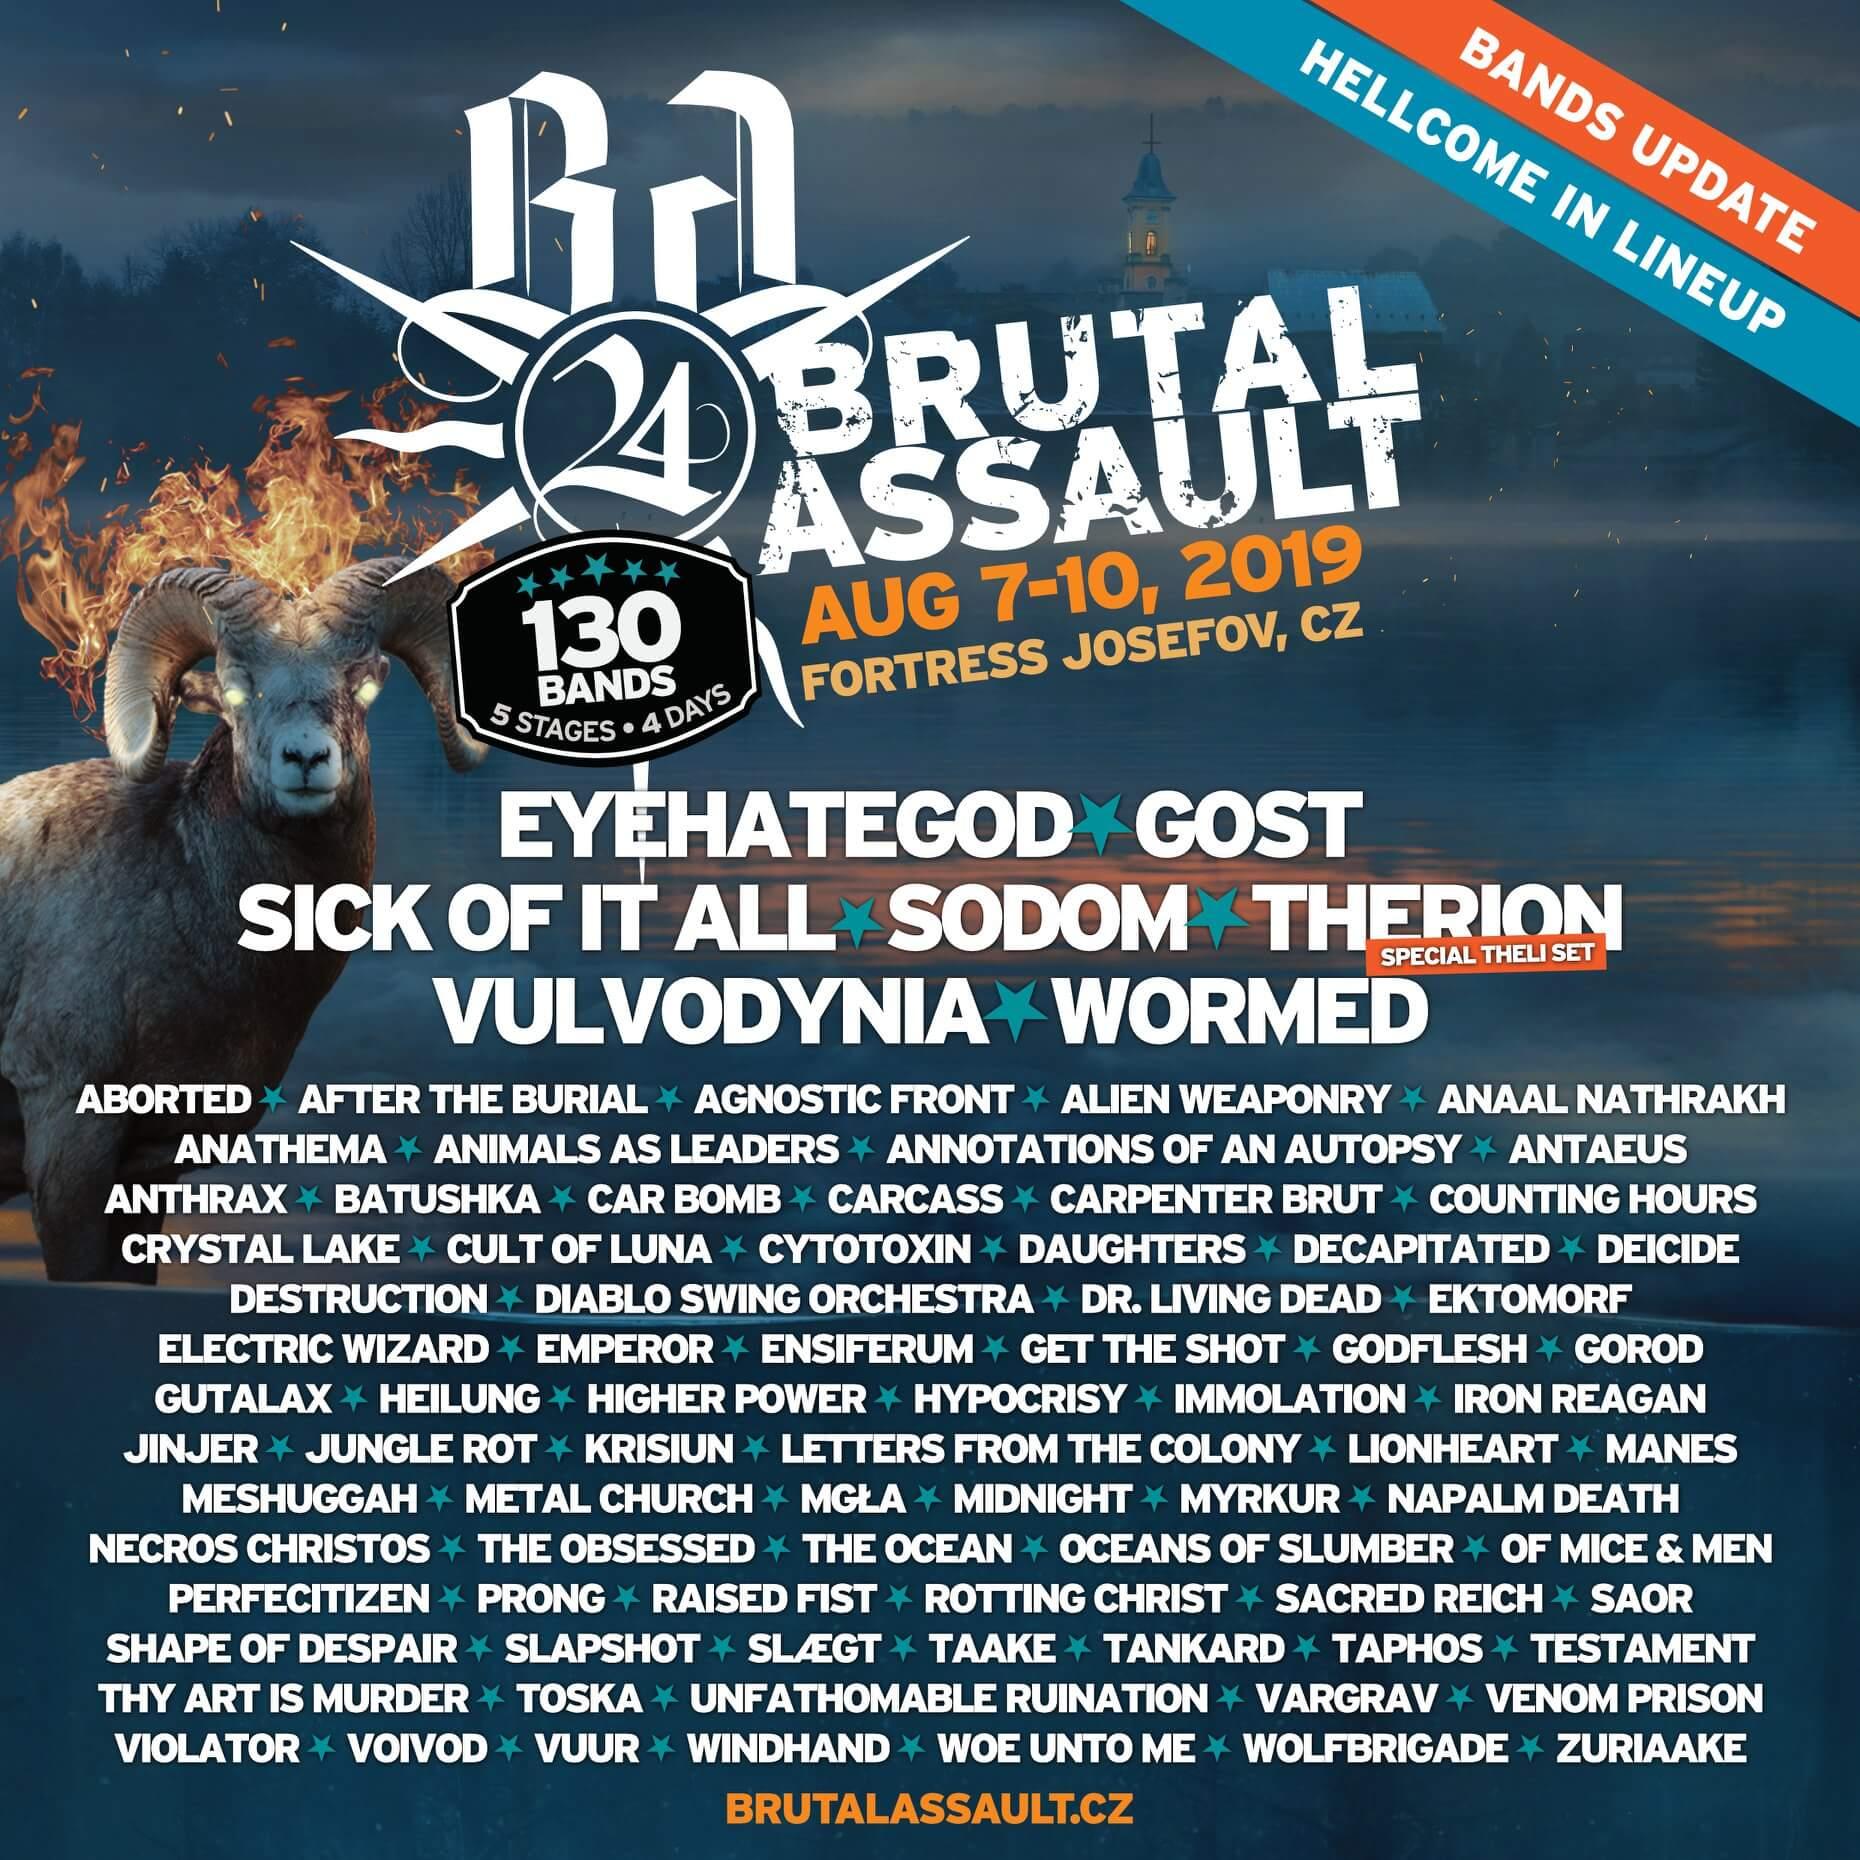 Brutal Assault 2019 Band Updates